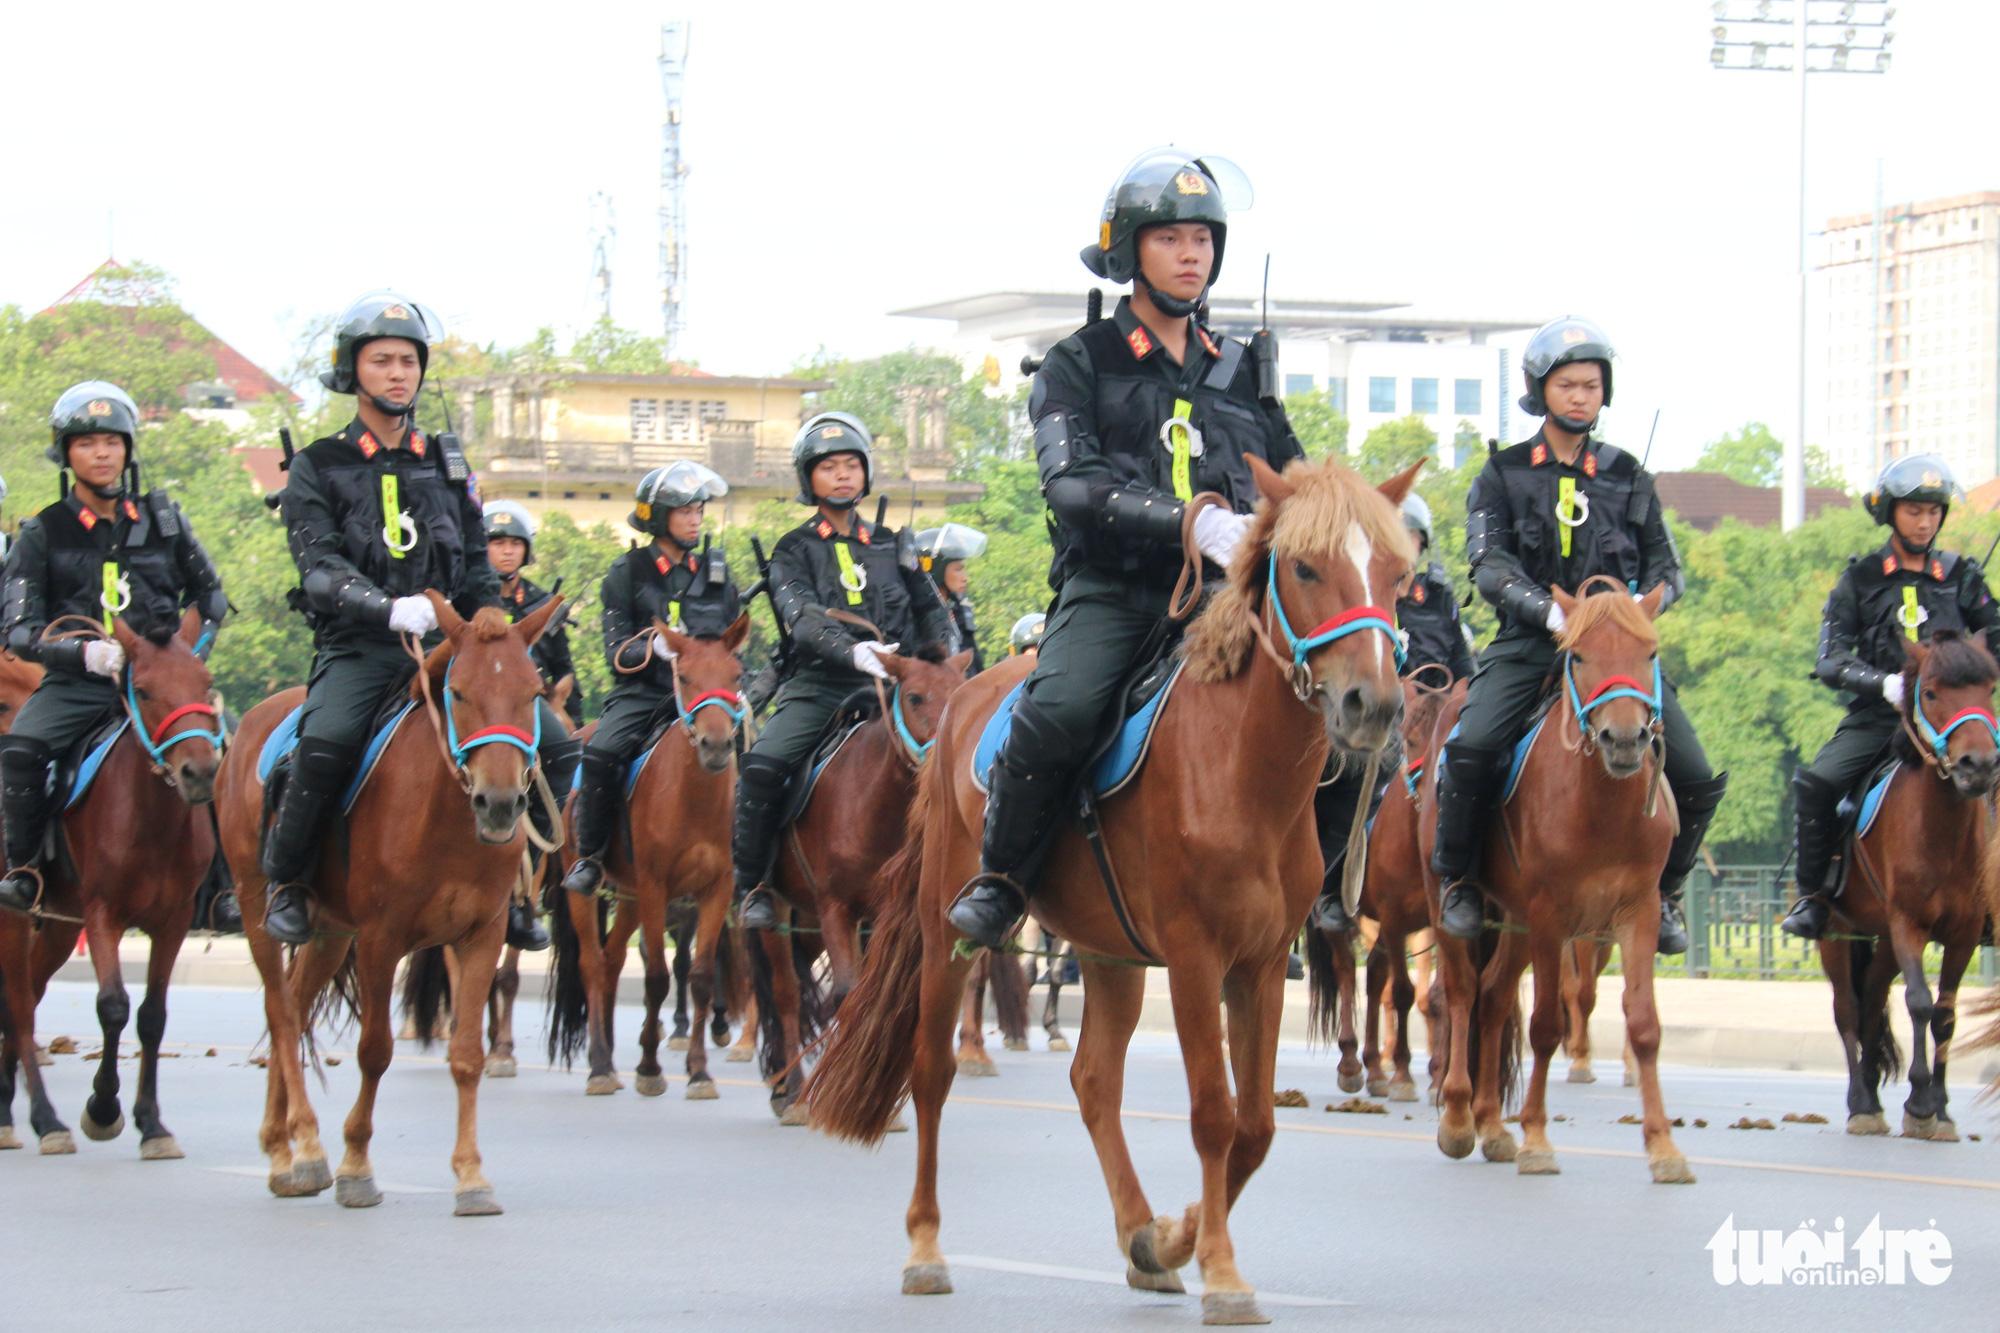 Patrol on horseback: Vietnam debuts mounted police force